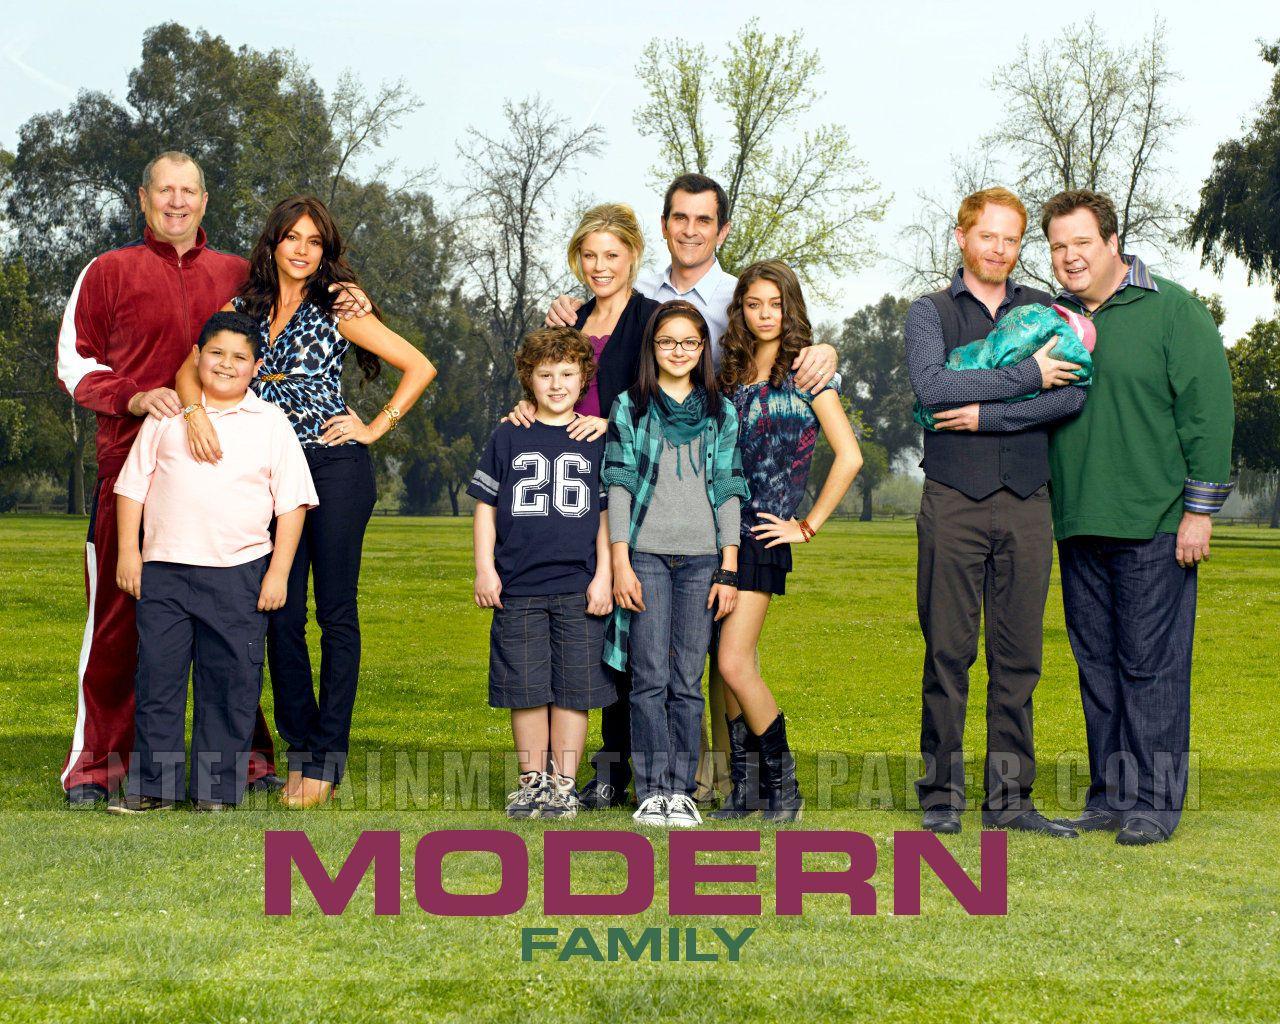 Modern Family | Cubalibre: Modern Family